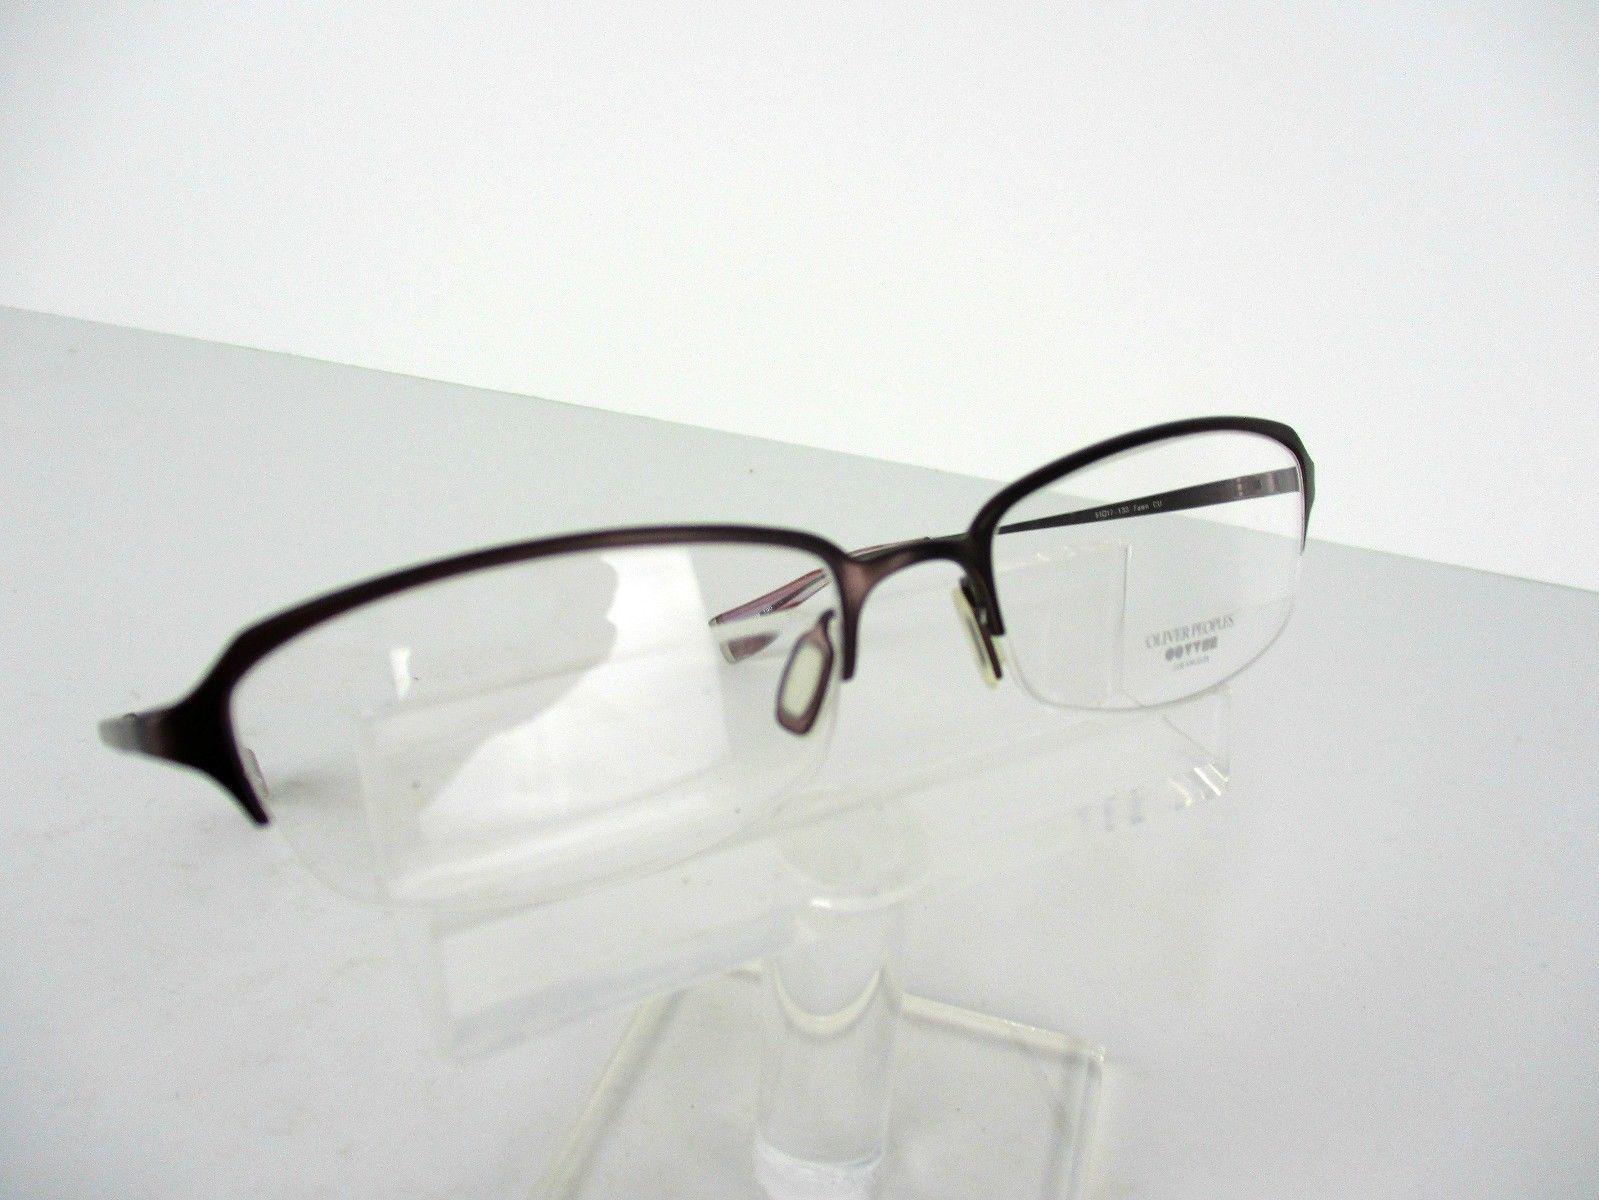 f8c683938d S l1600. S l1600. Previous. Oliver Peoples Fawn (CU) Purple TITANIUM 51 x  17 133 mm Eyeglass Frames